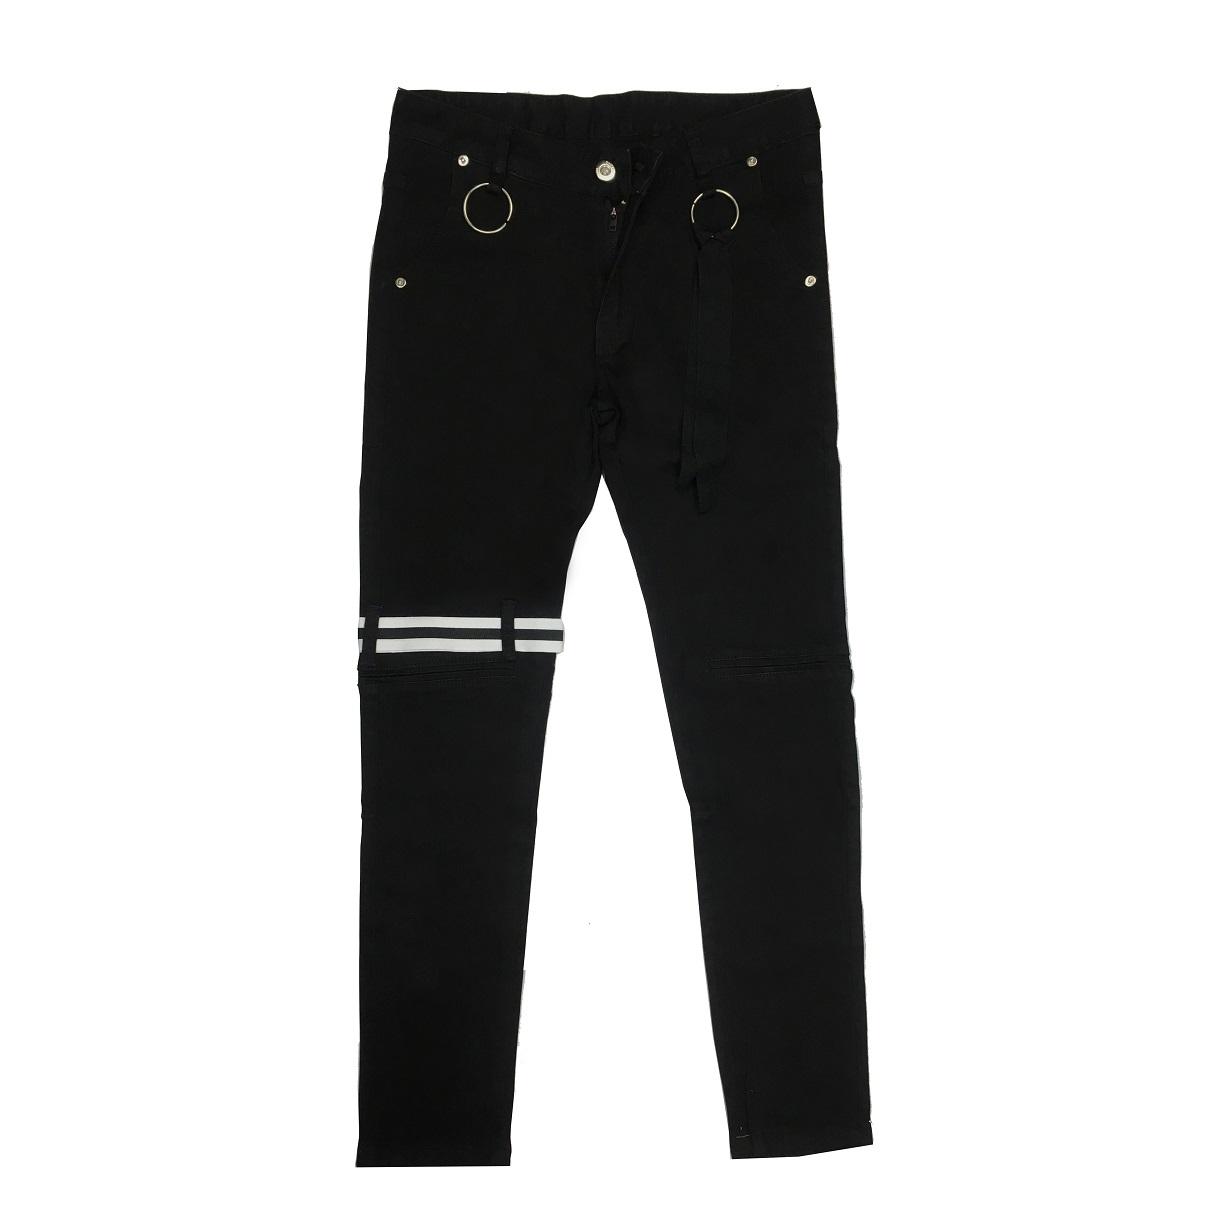 DVSL Jean With Straps Black